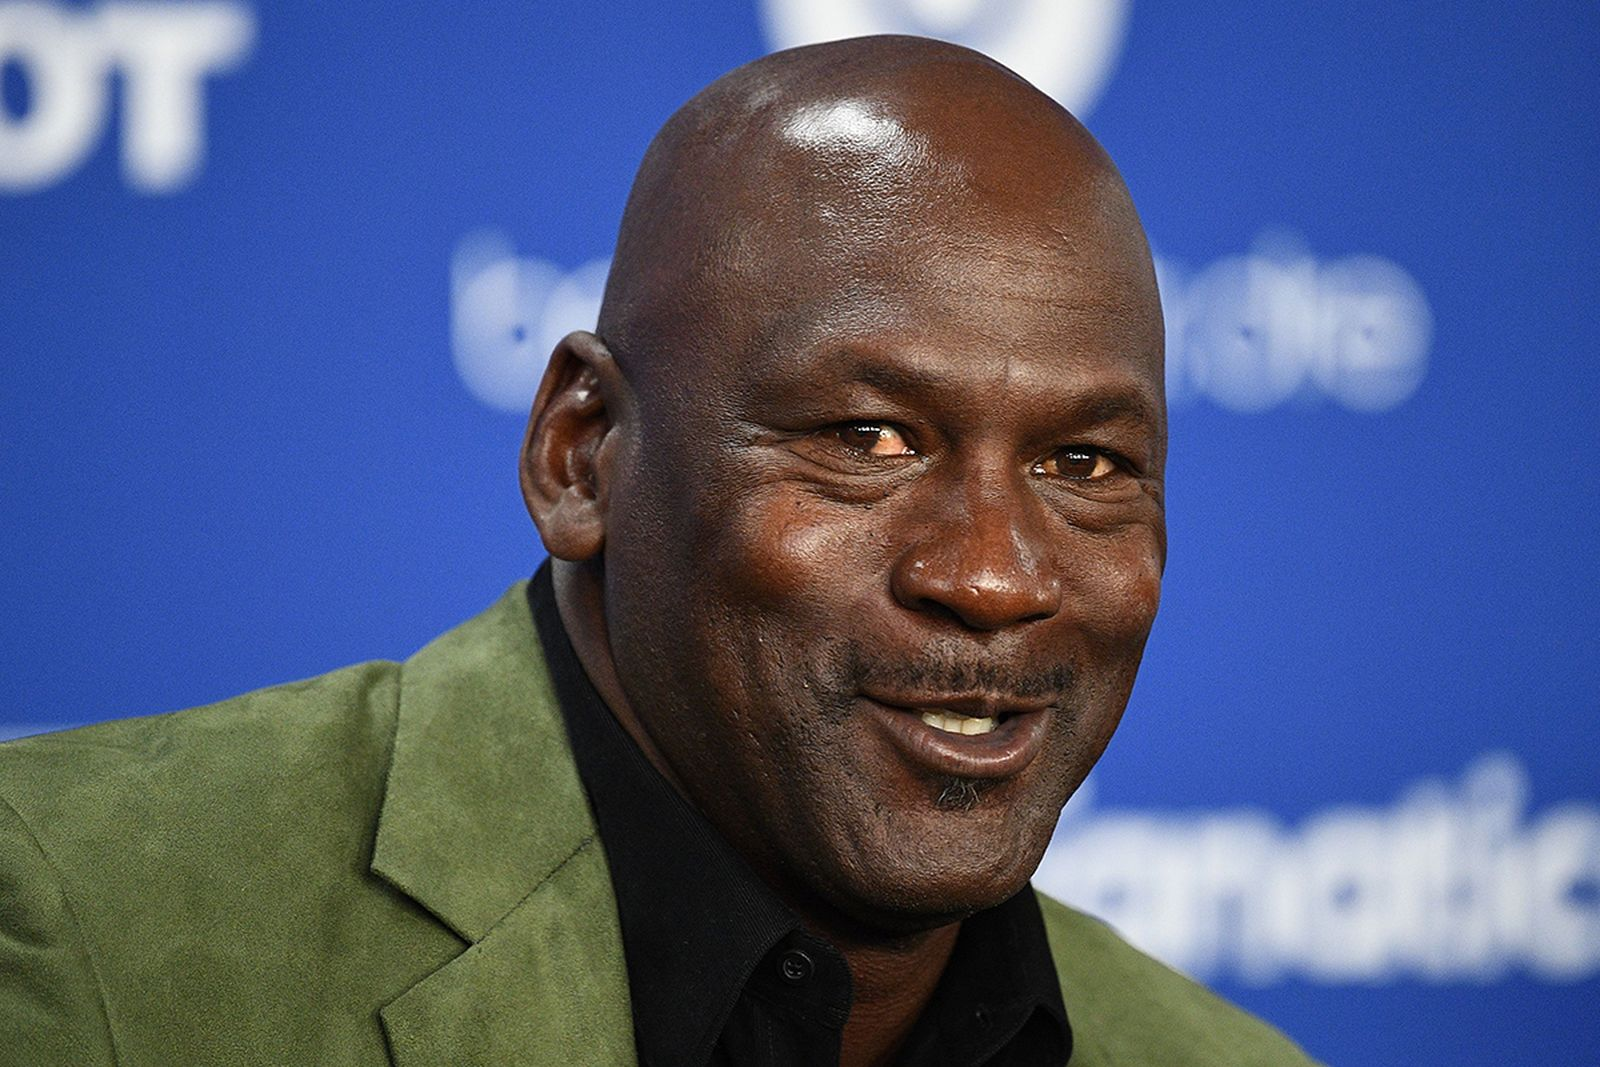 Michael Jordan green jacket